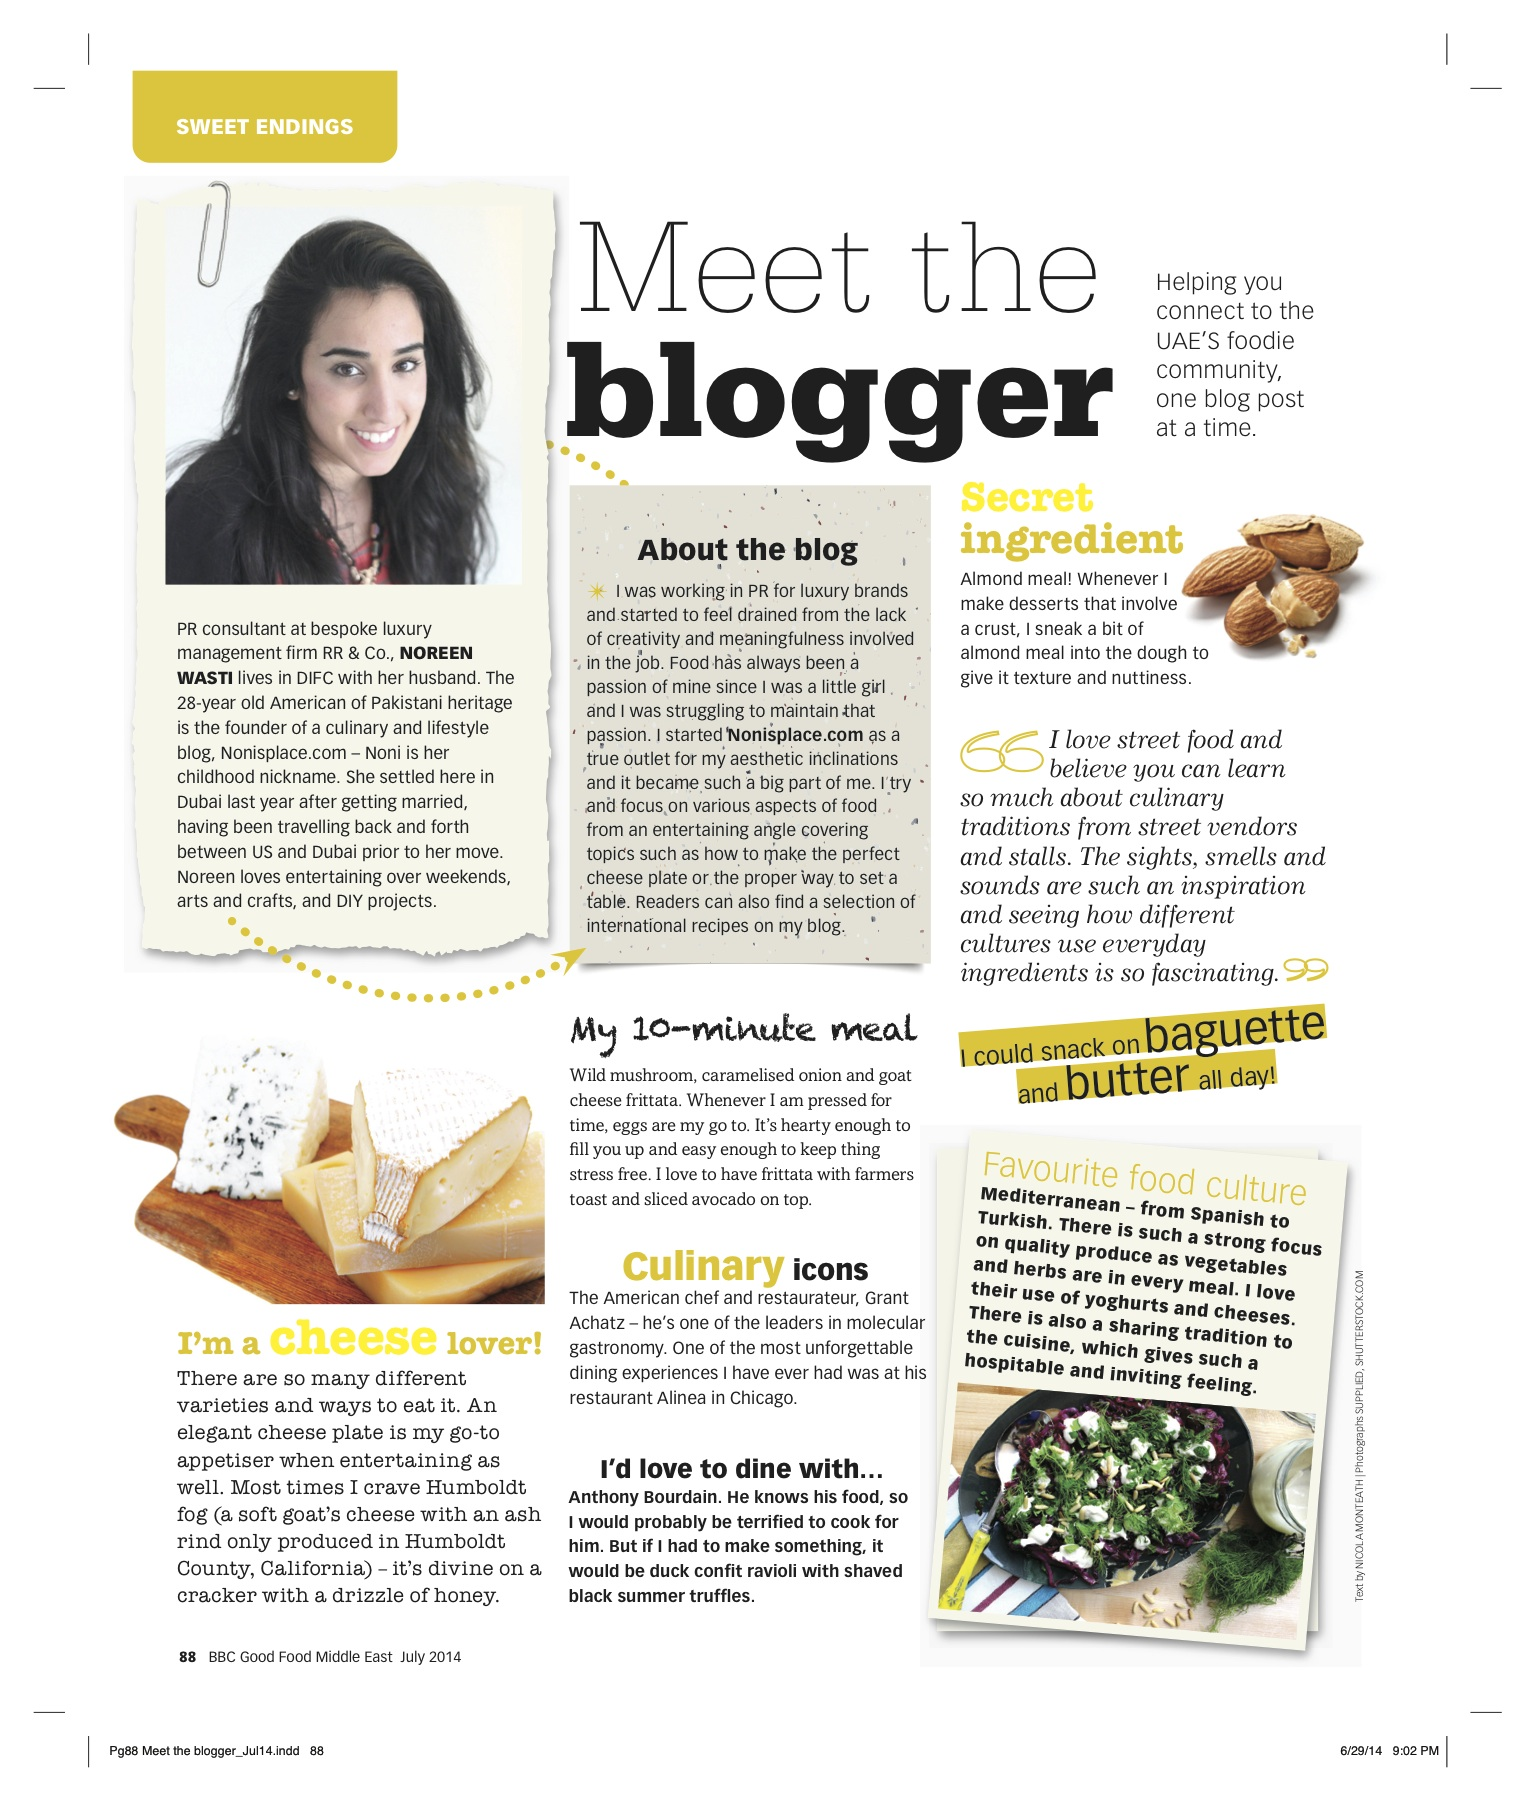 Pg88 Meet the blogger_Jul14.jpg